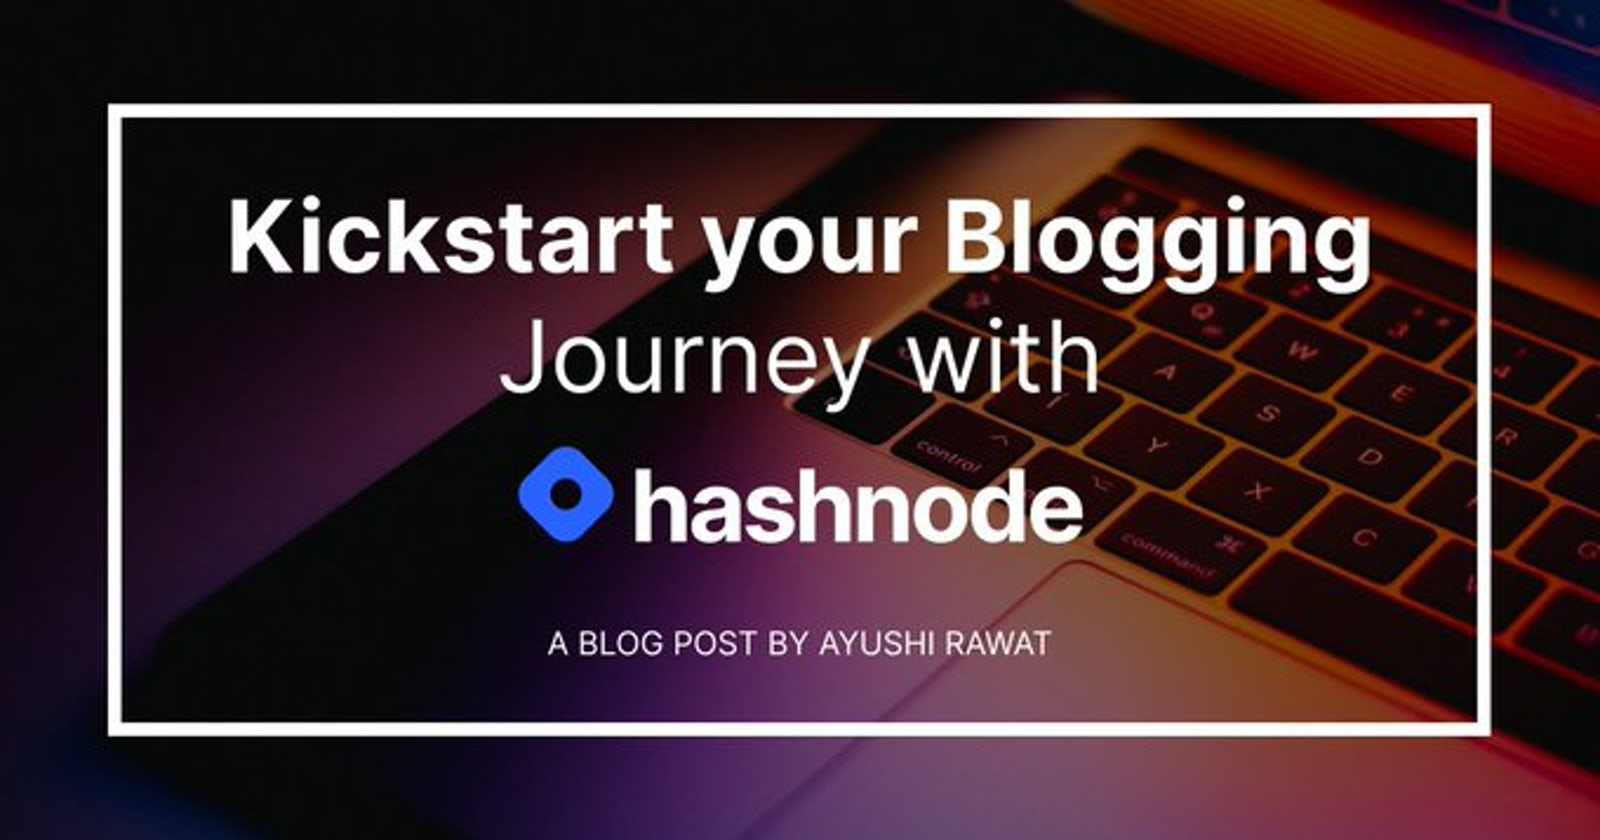 Kickstart your Blogging Journey with Hashnode!